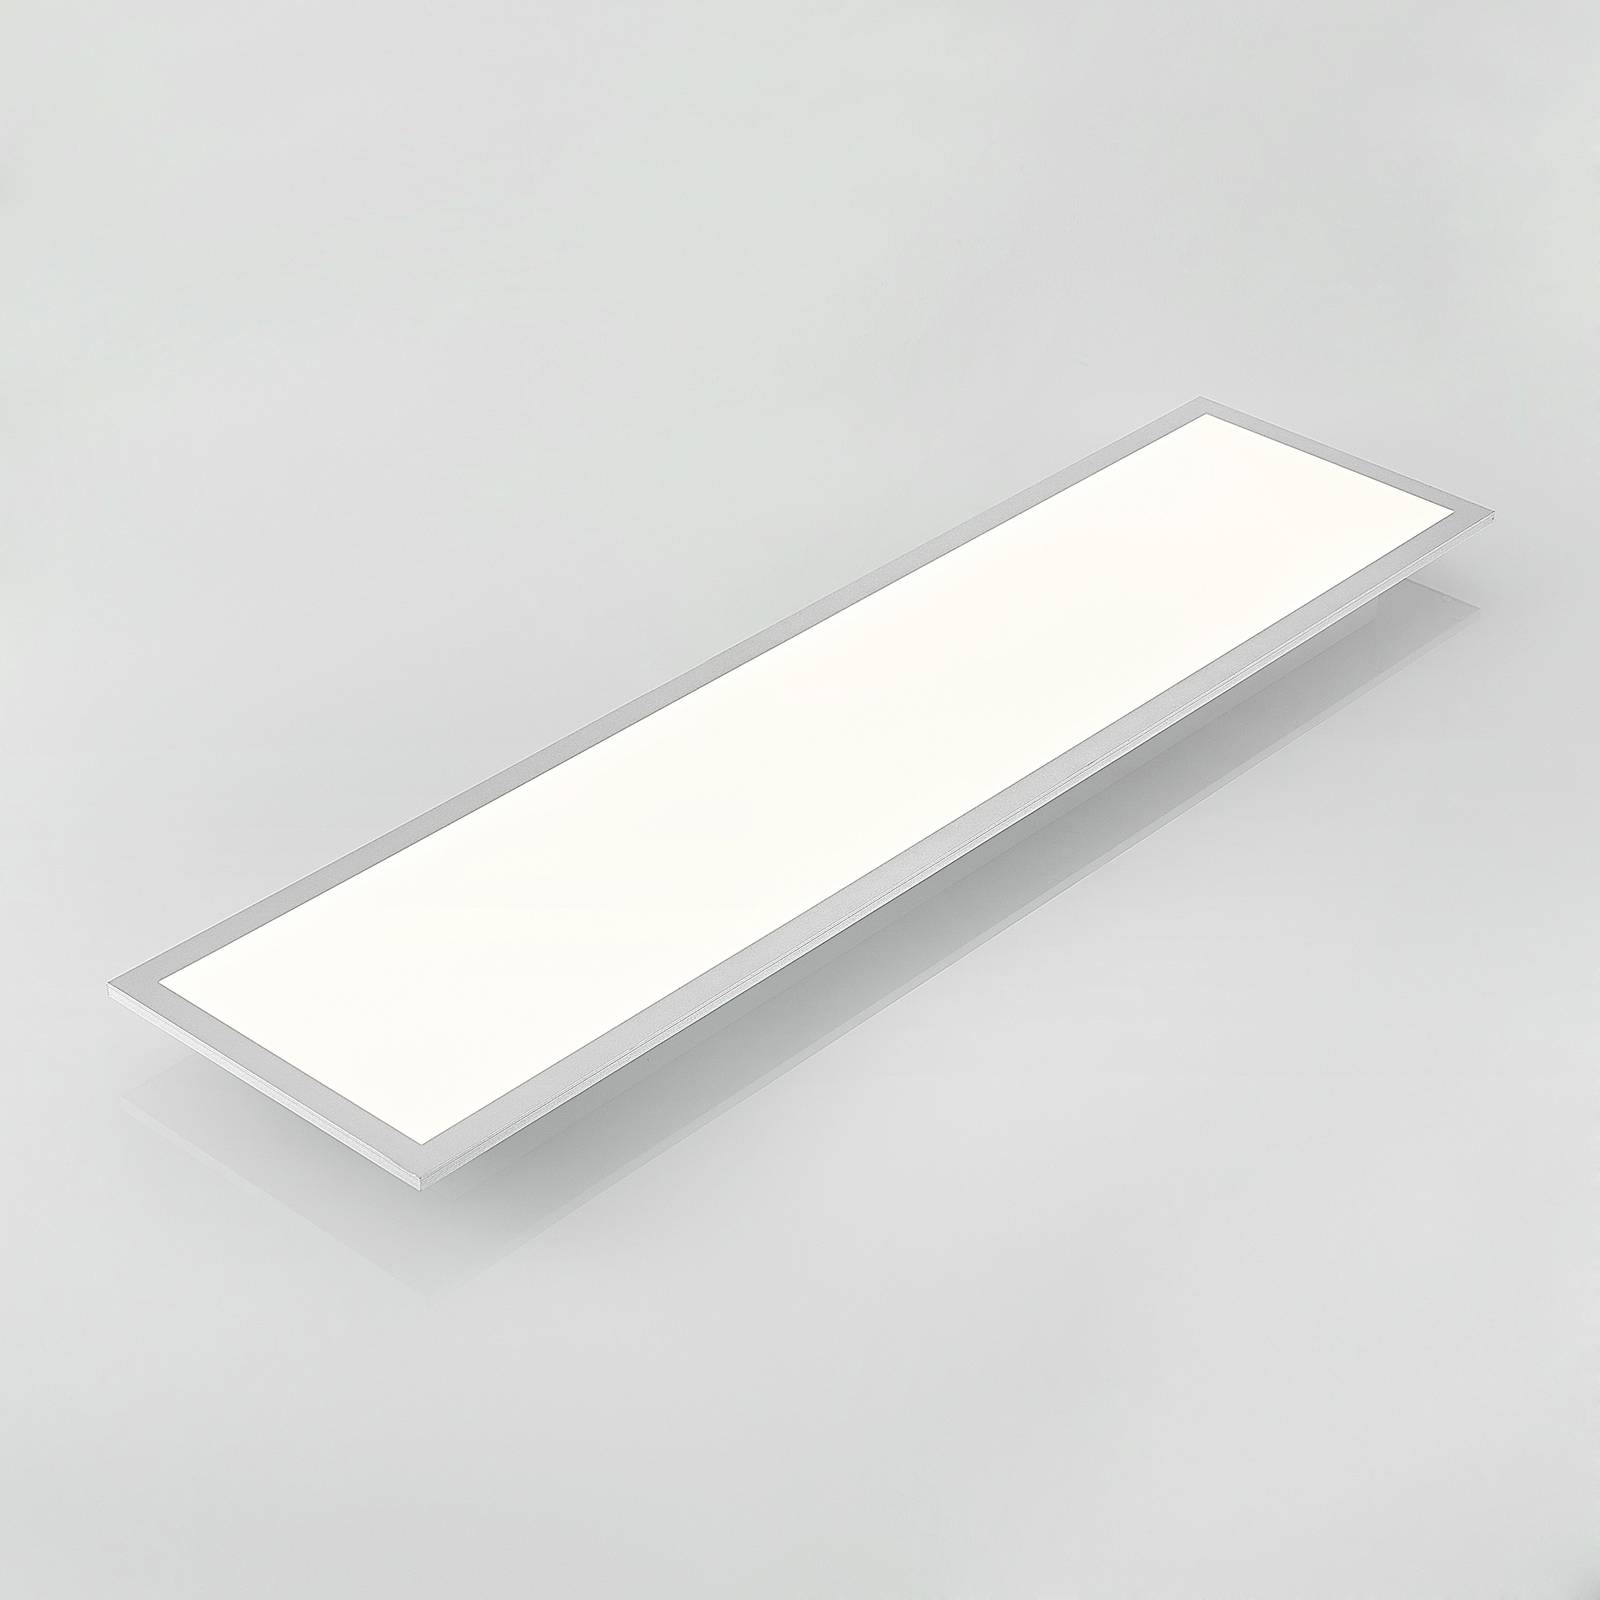 Lindby Zemmi -LED-kattovalaisin, 120 x 30 cm